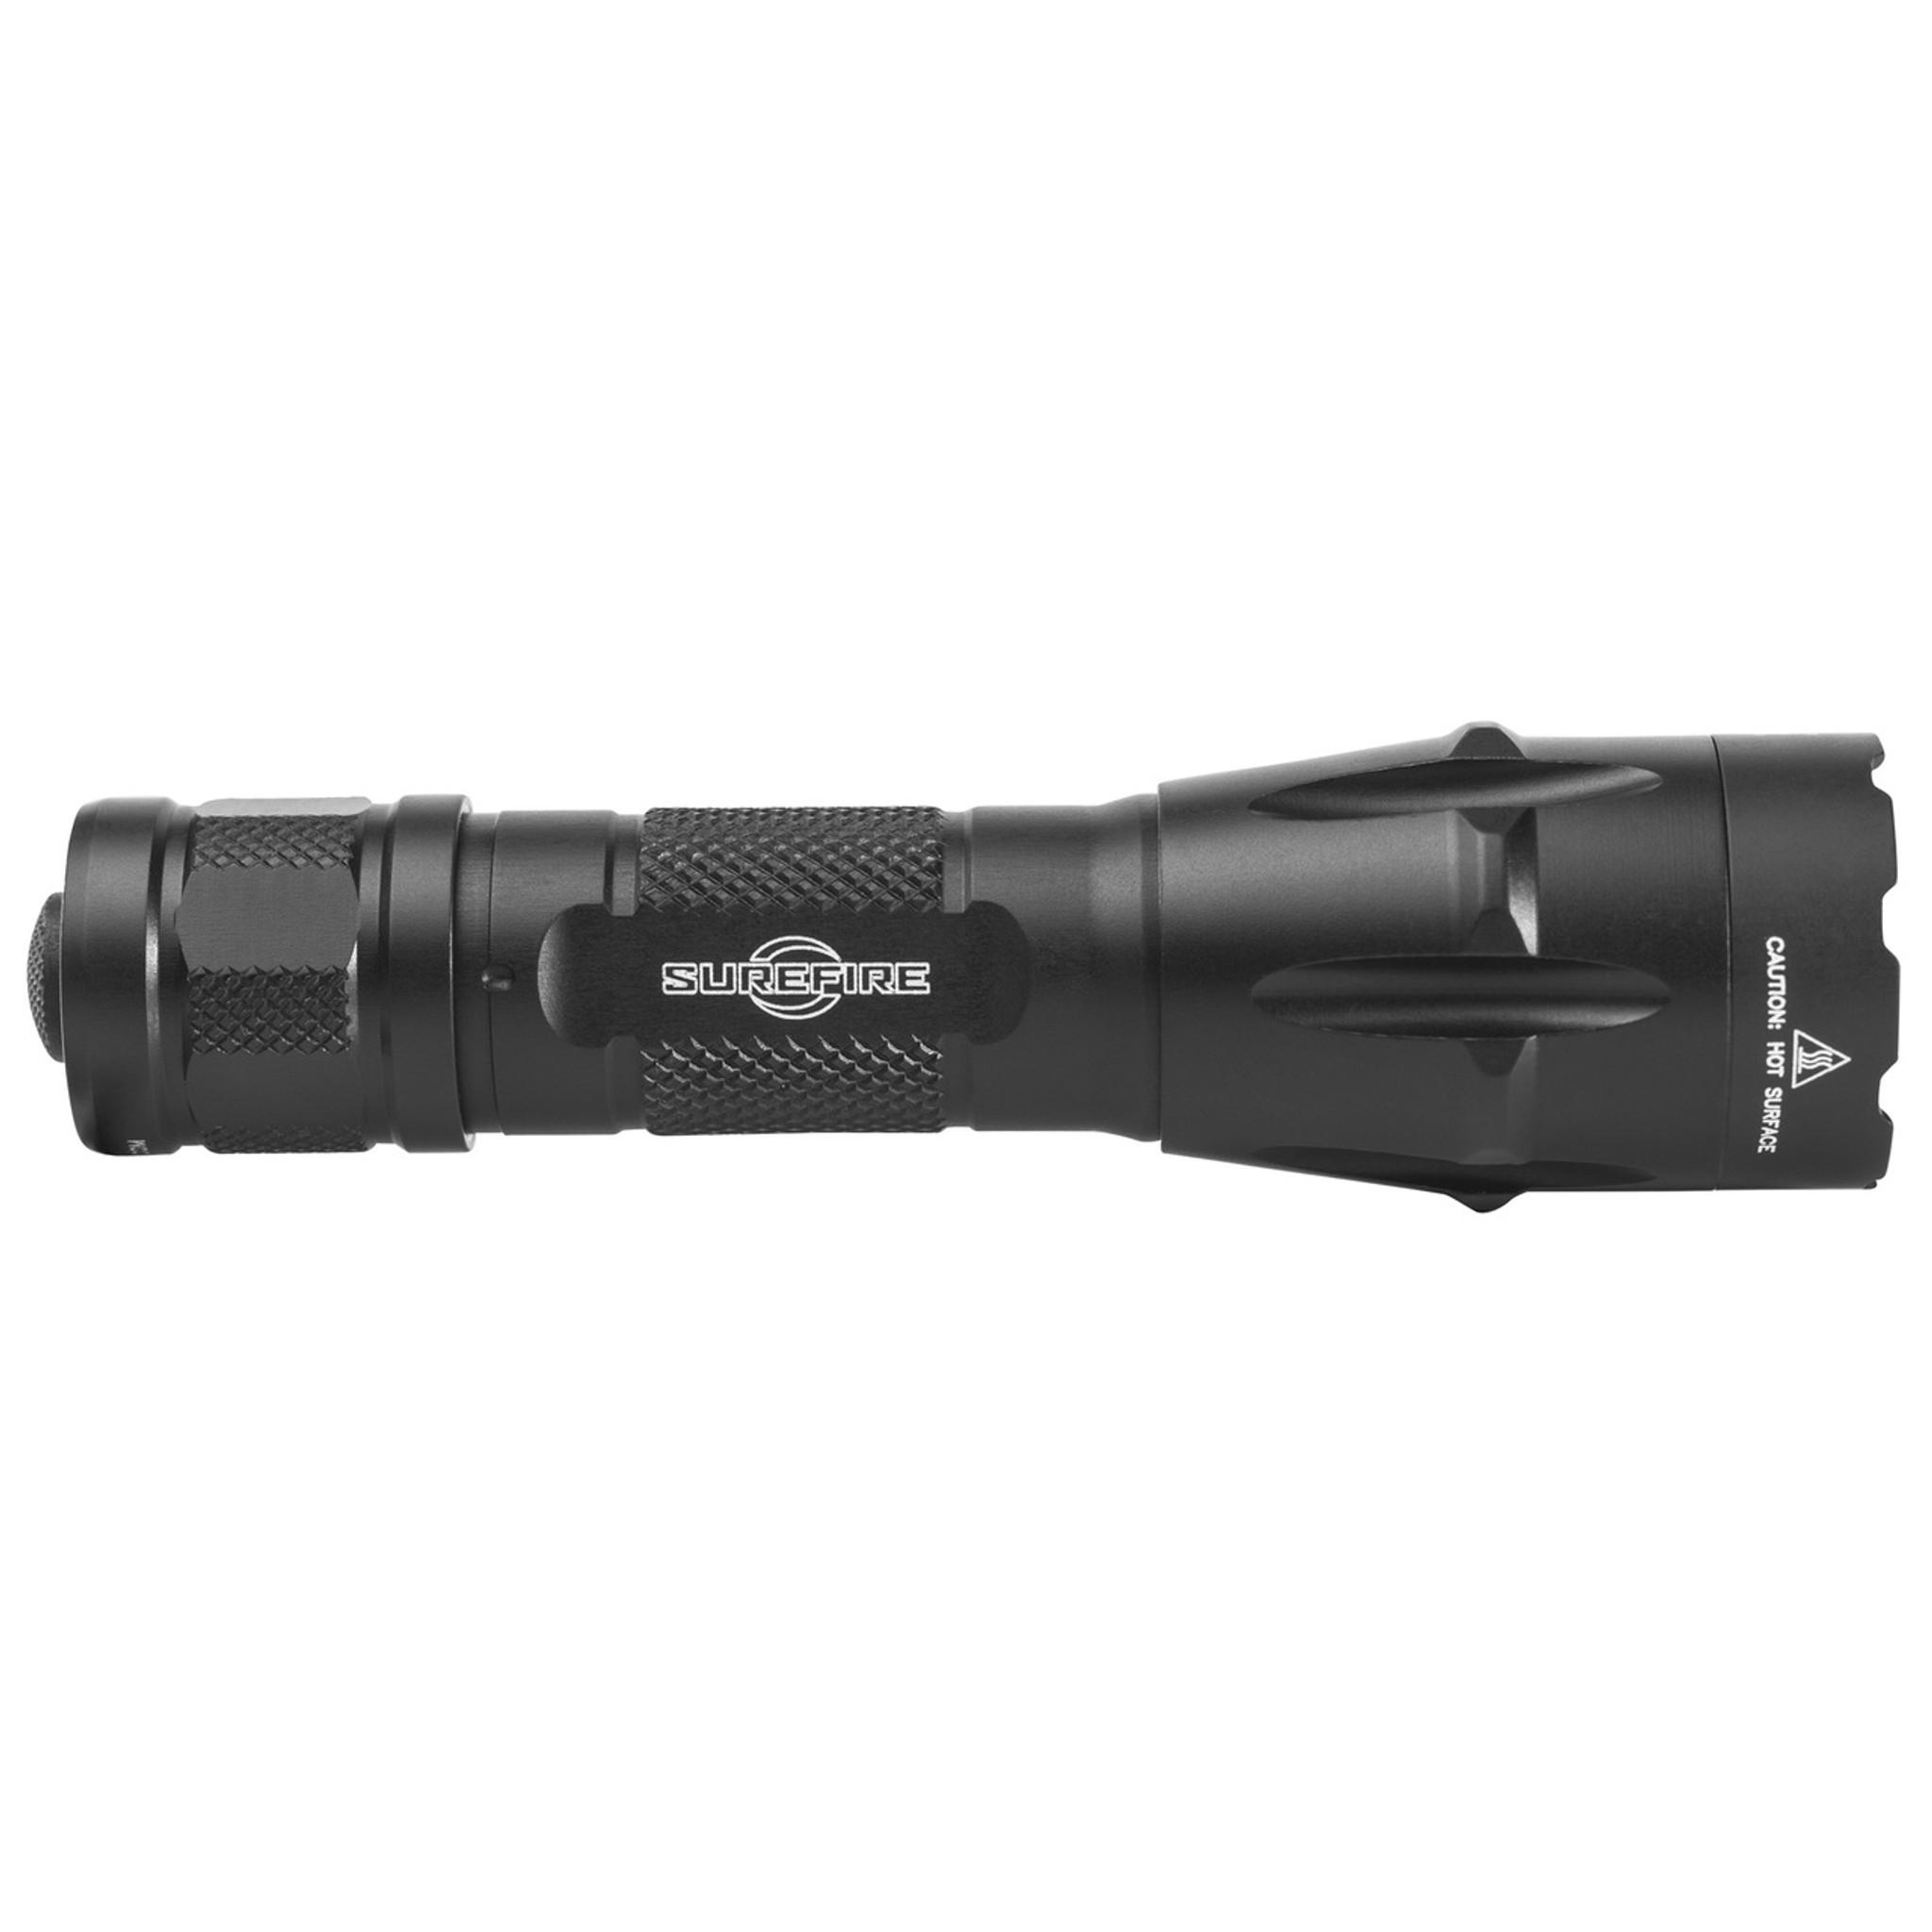 Black NEW Surefire FURY-DFT Dual Fuel Tactical Flashlight 1500 Lumens